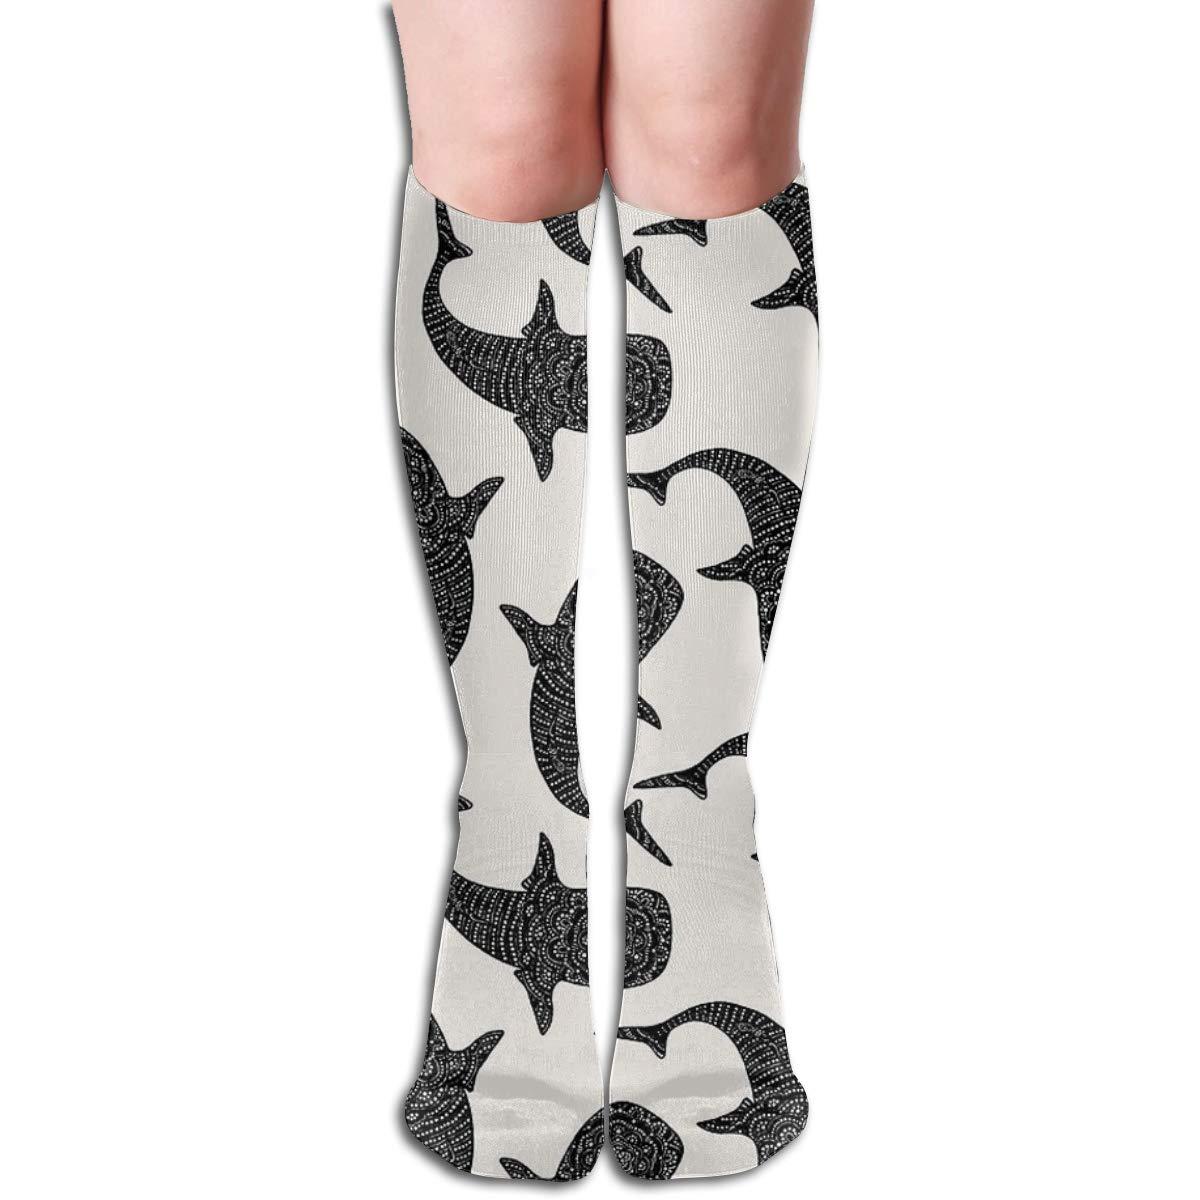 Marokintana Whale Shark II Compression Socks Soccer Socks High Socks For Running,Medical,Athletic,Edema,Varicose Veins,Travel,Nursing.